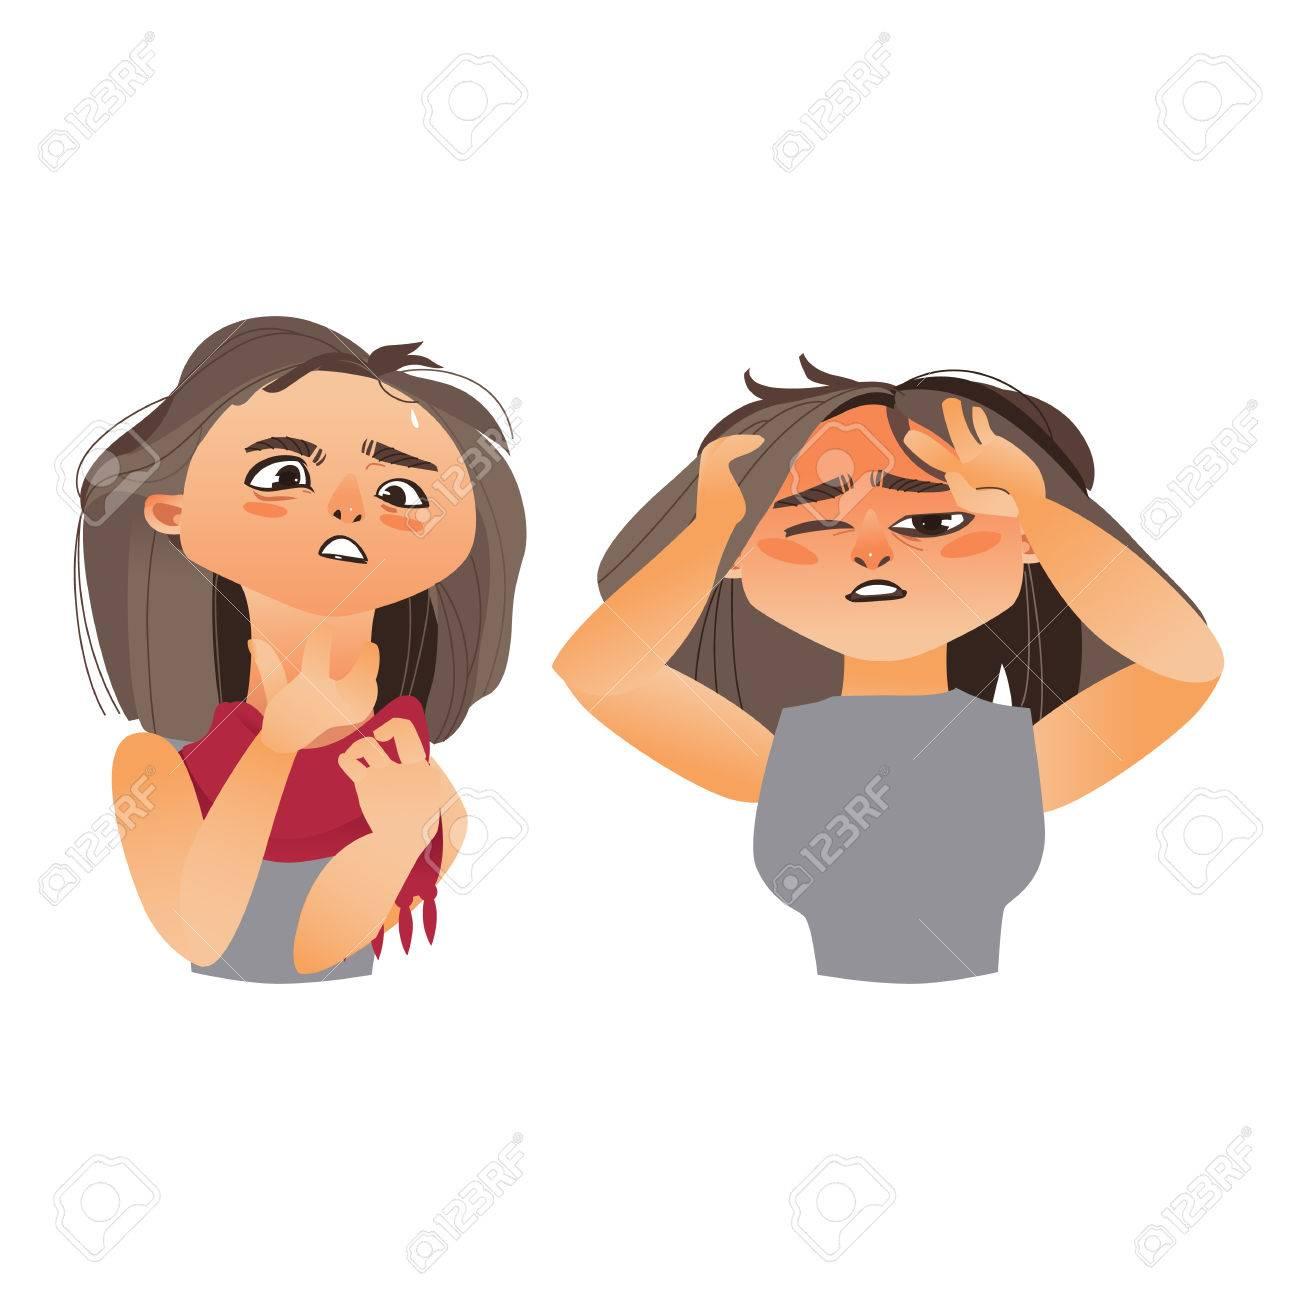 woman having flu symptoms headache and sore throat cartoon